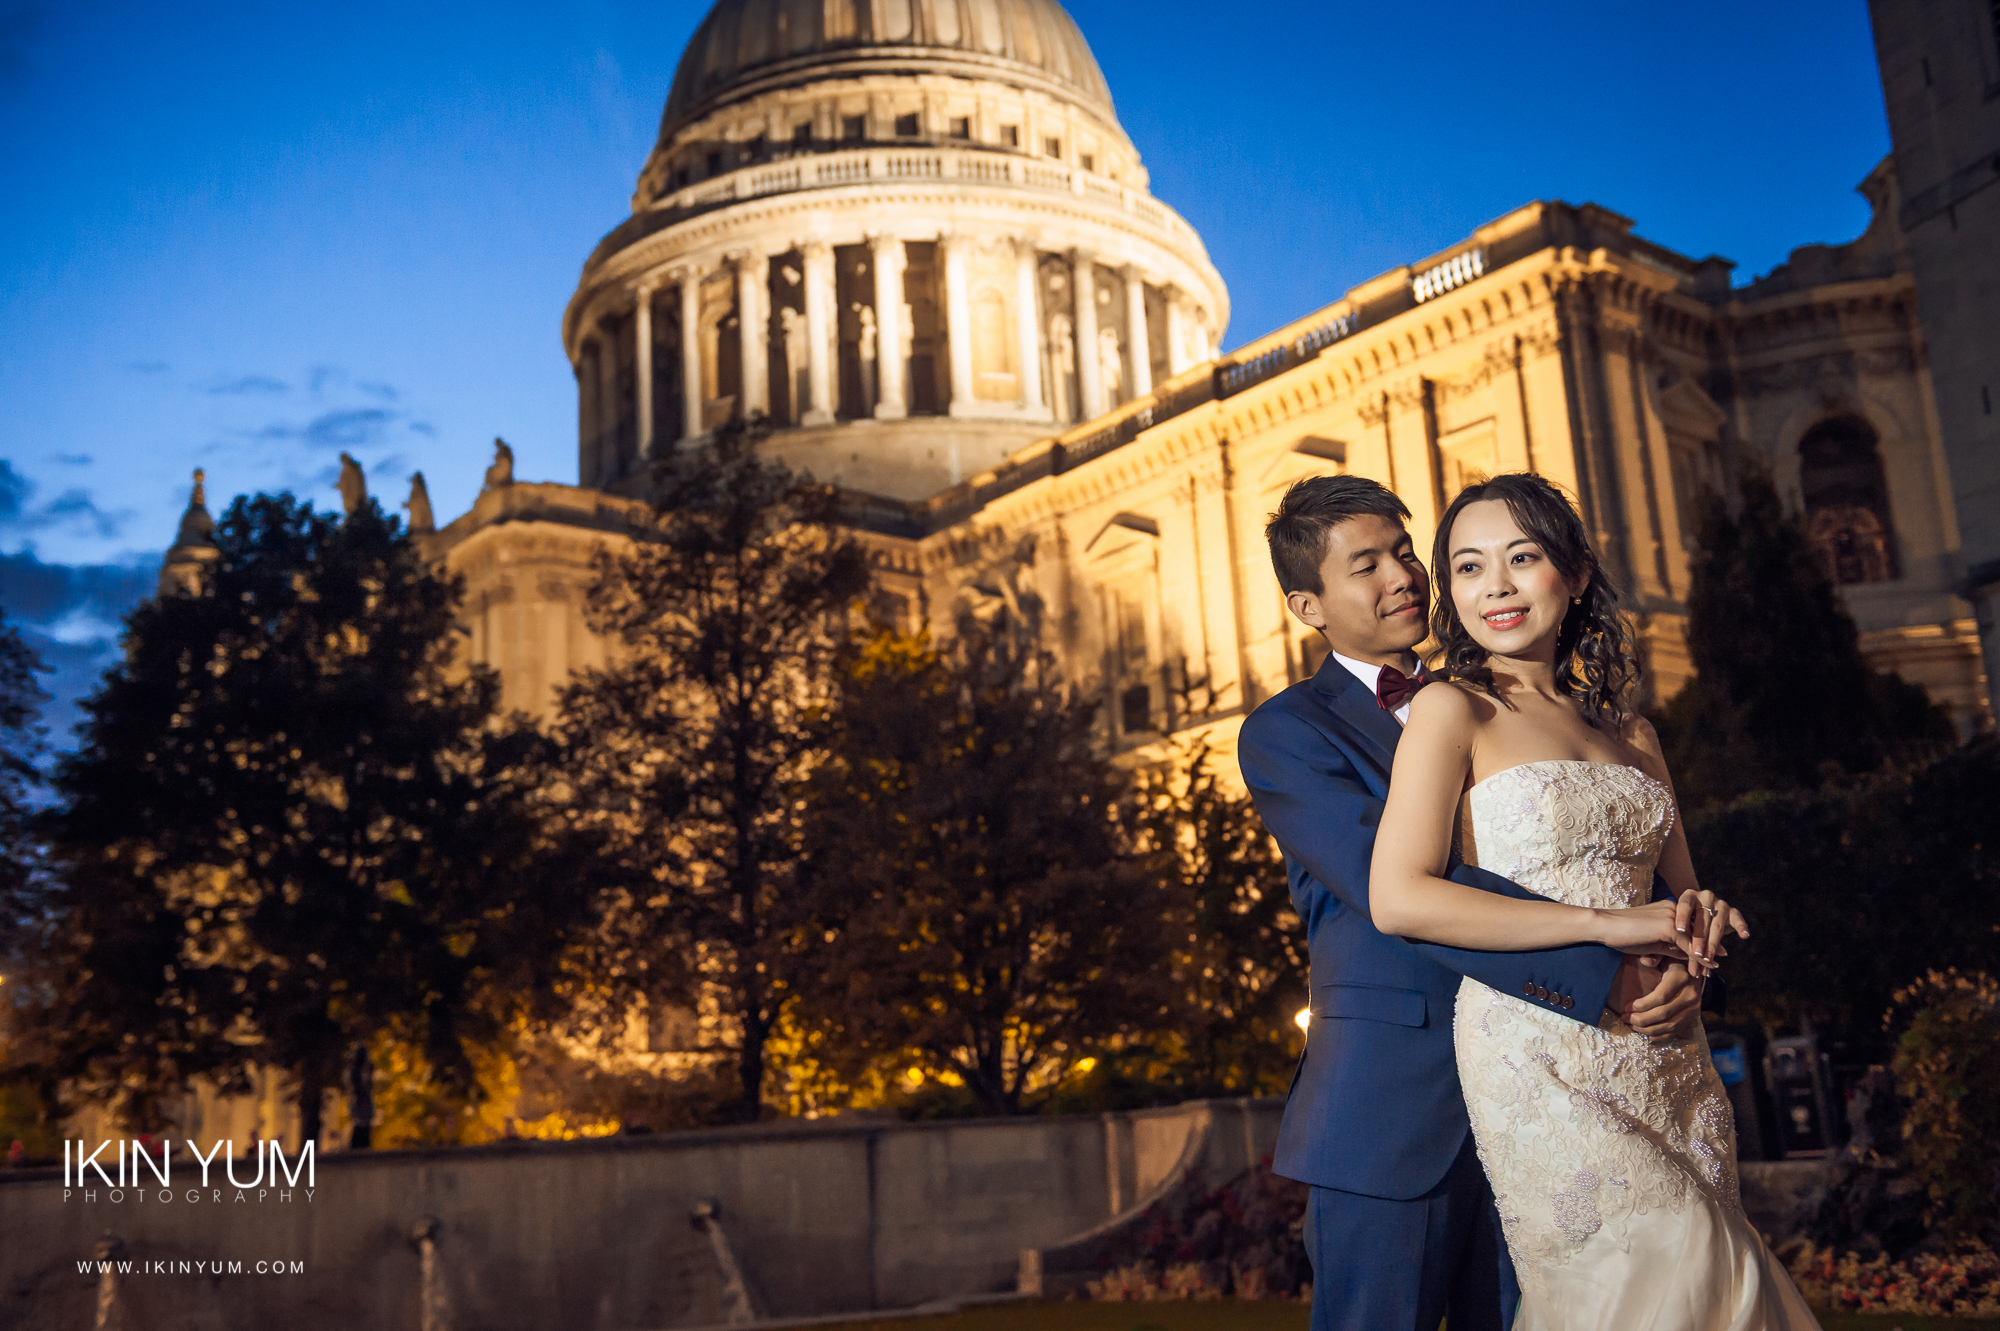 Chloe & Carlos Pre-Wedding Shoot- Ikin Yum Photography-0137.jpg